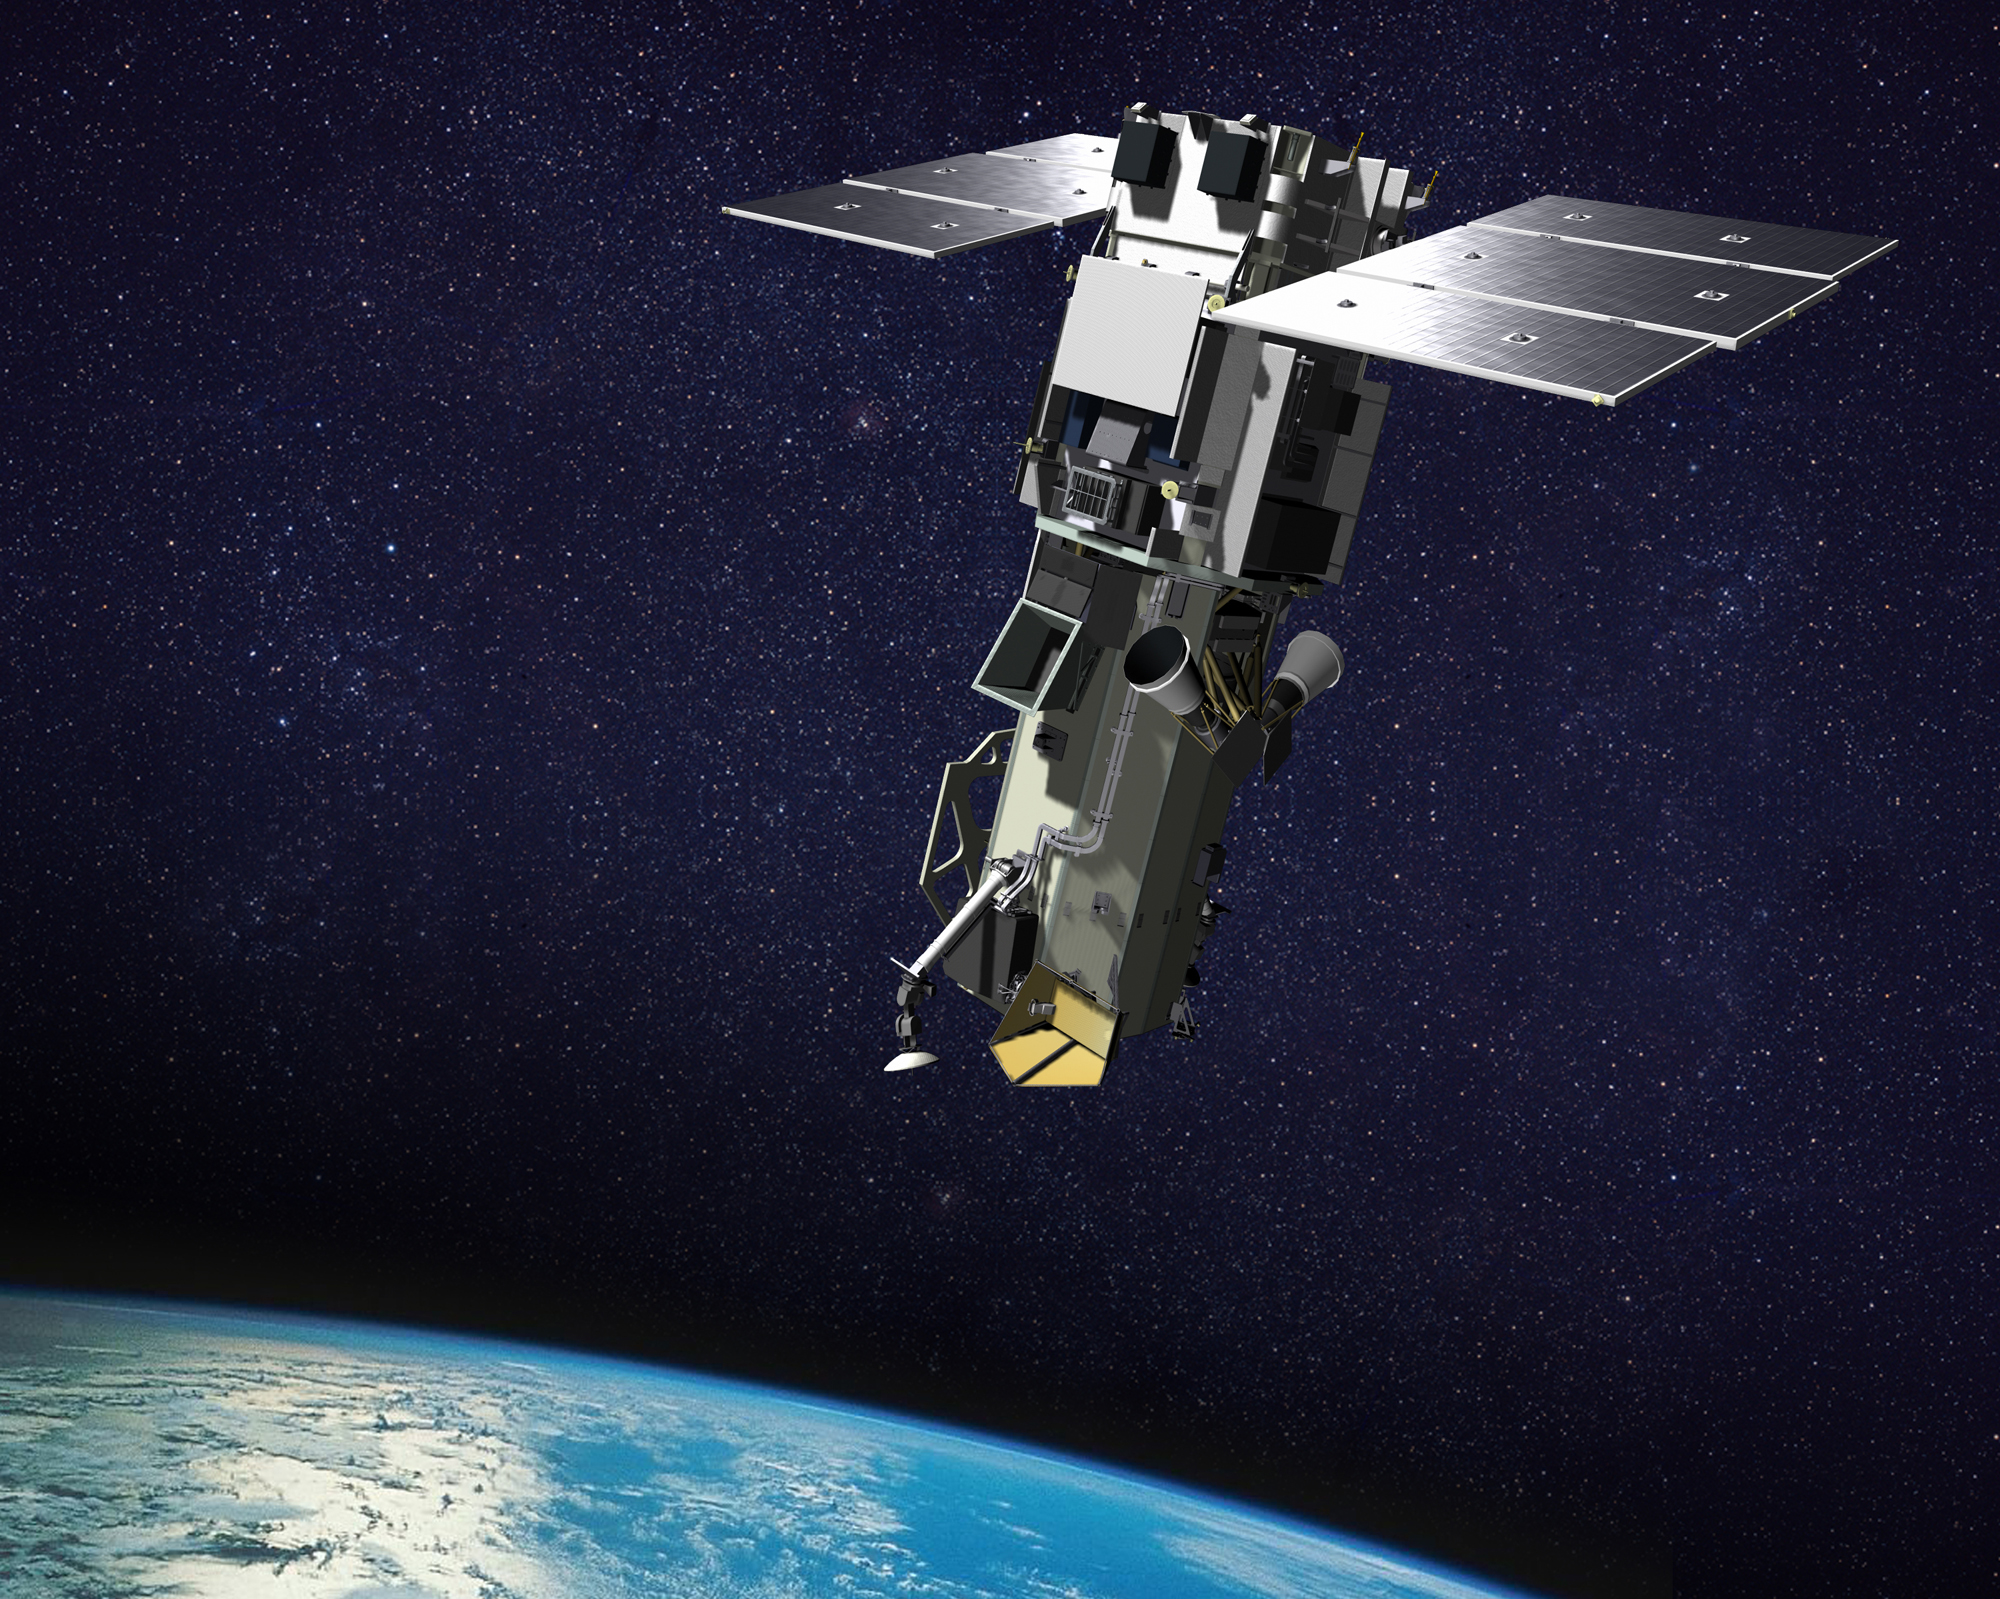 WorldView Geocarto International Centre Ltd - Worldview 2 satellite